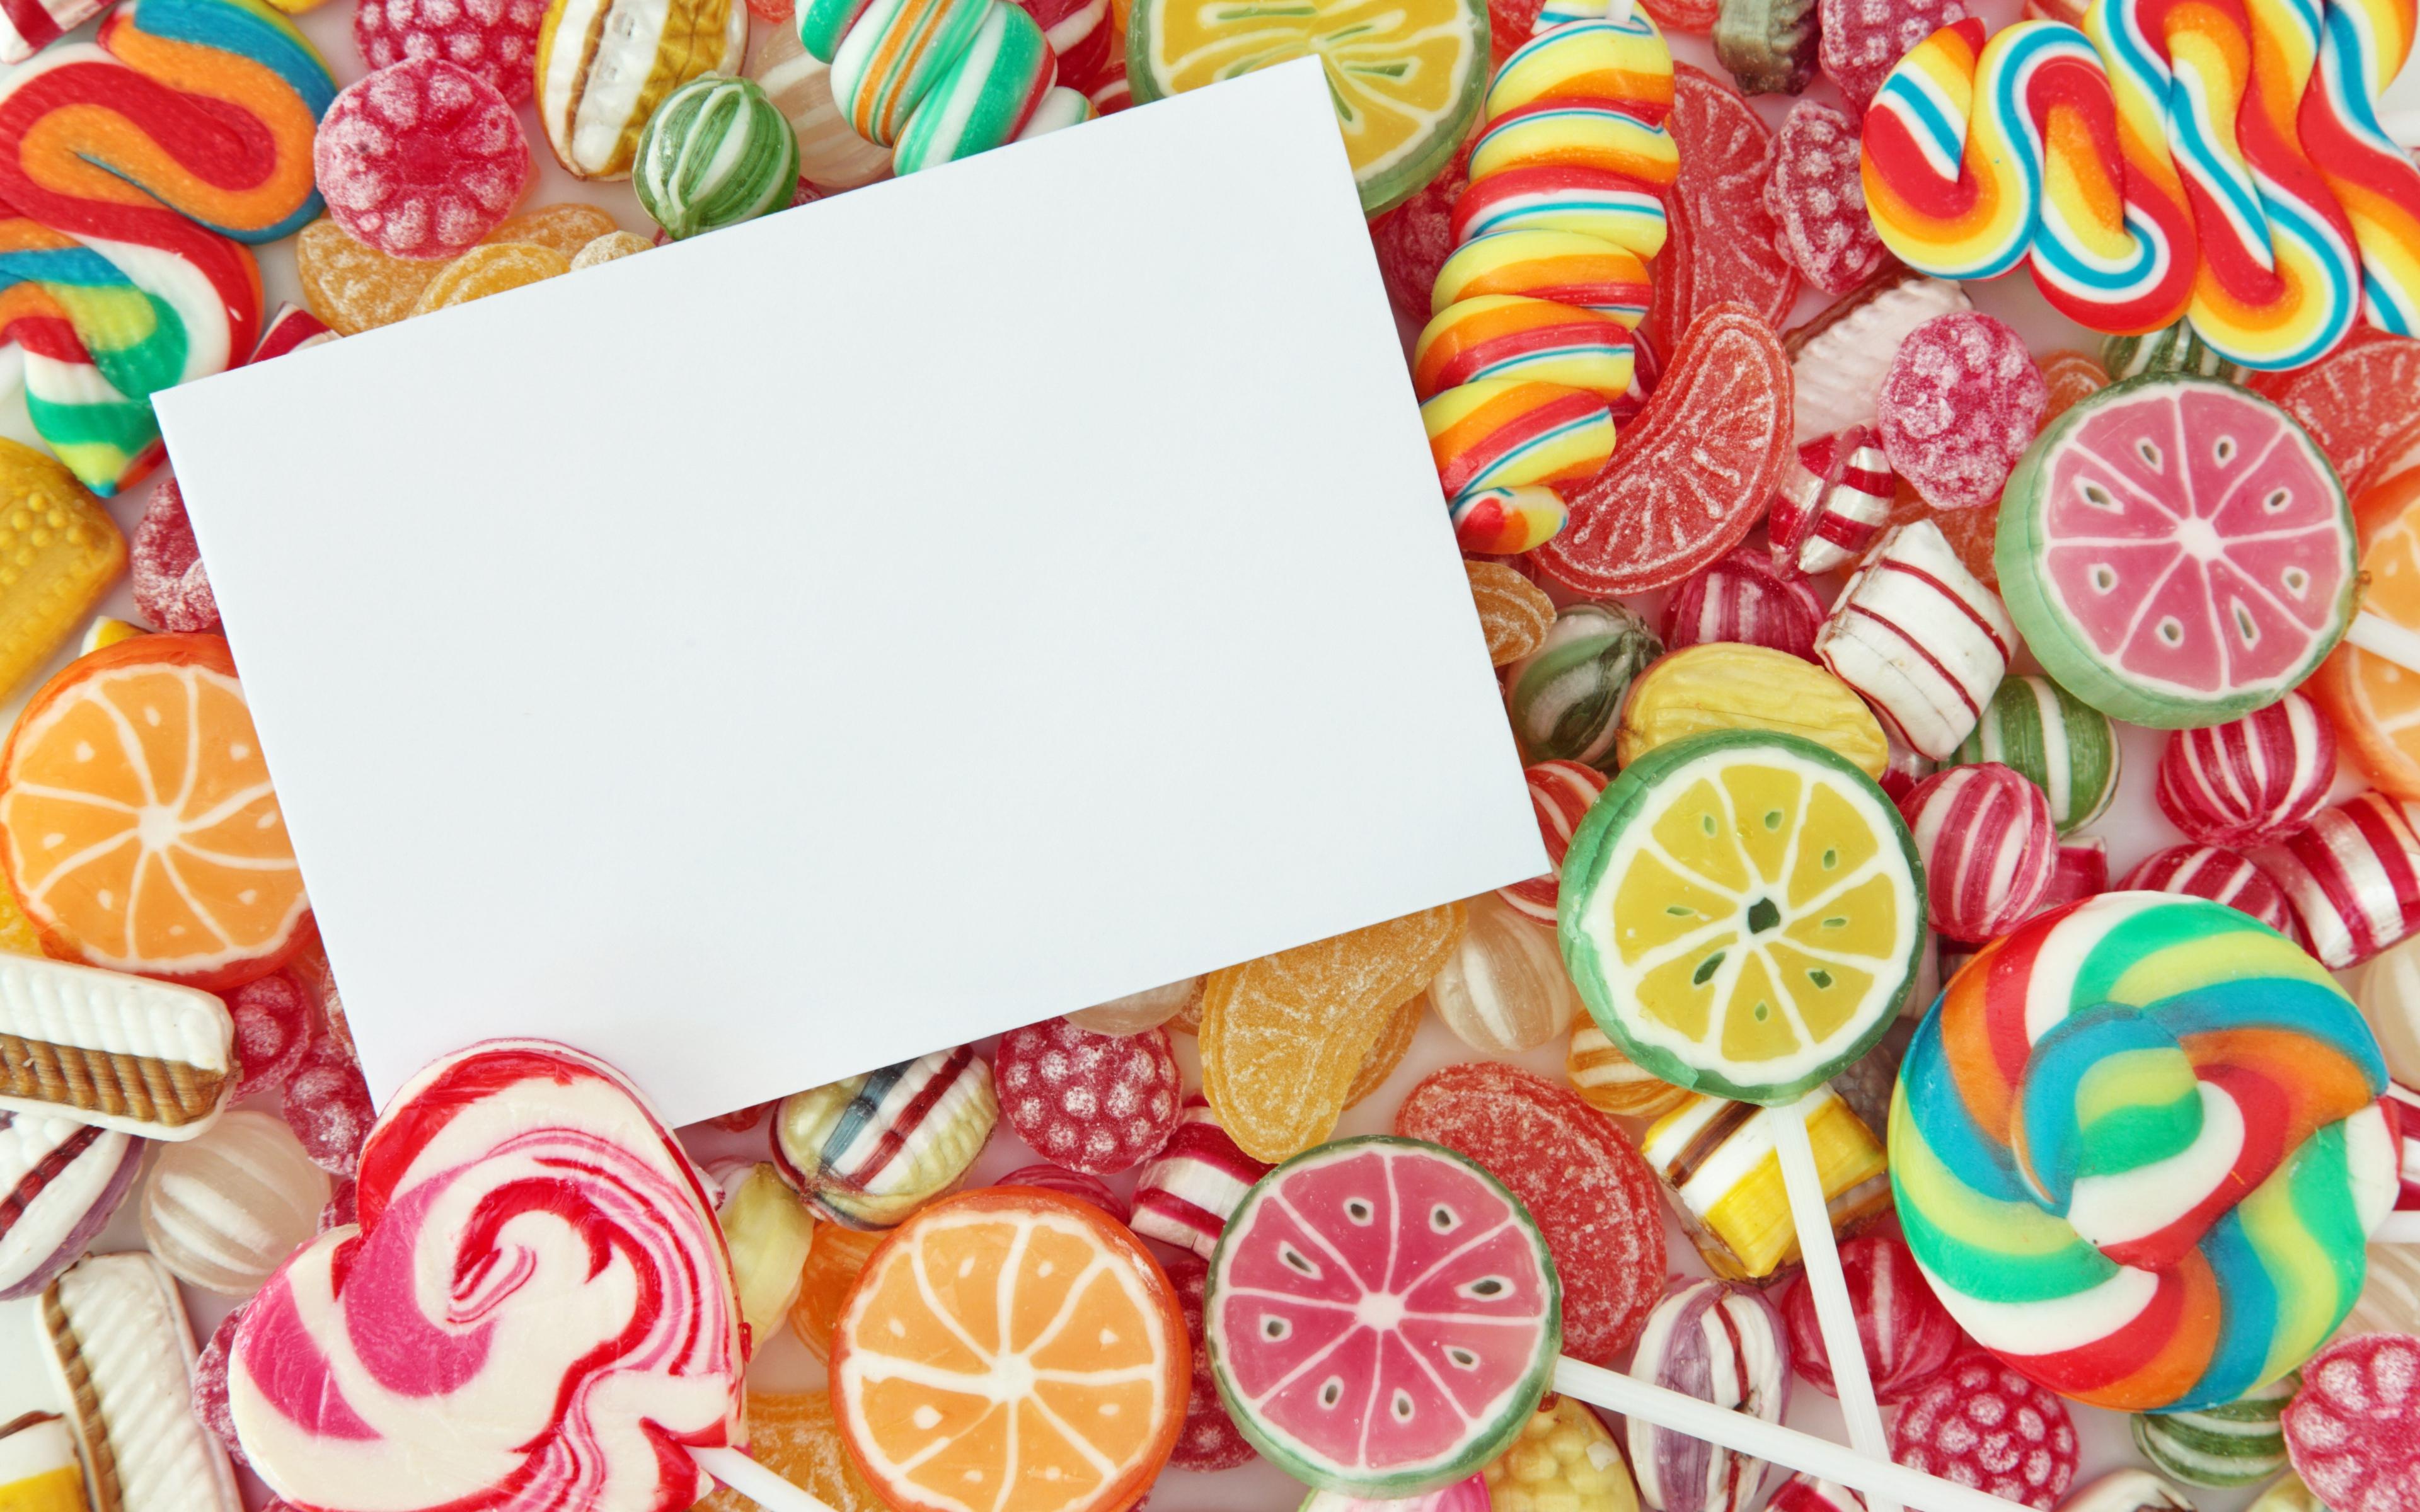 Desktop Candy Wallpapers 3840x2400